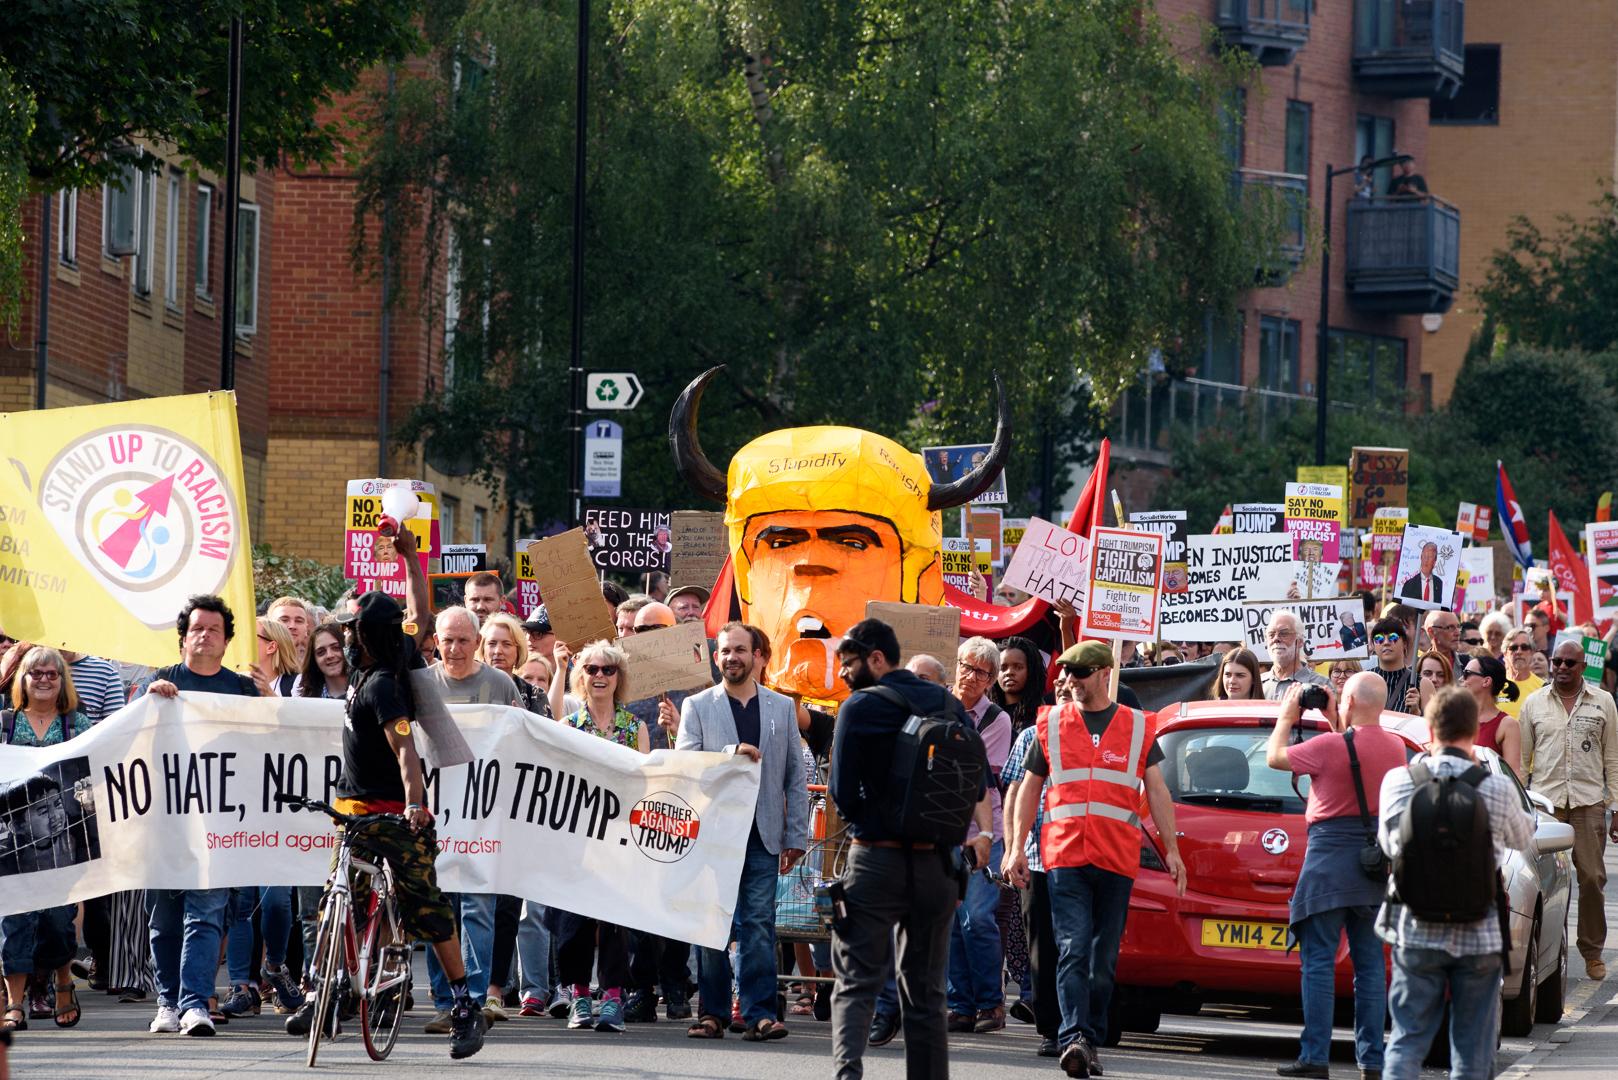 Sheffield Anti-Trump rally July 2018 Blog31.jpg